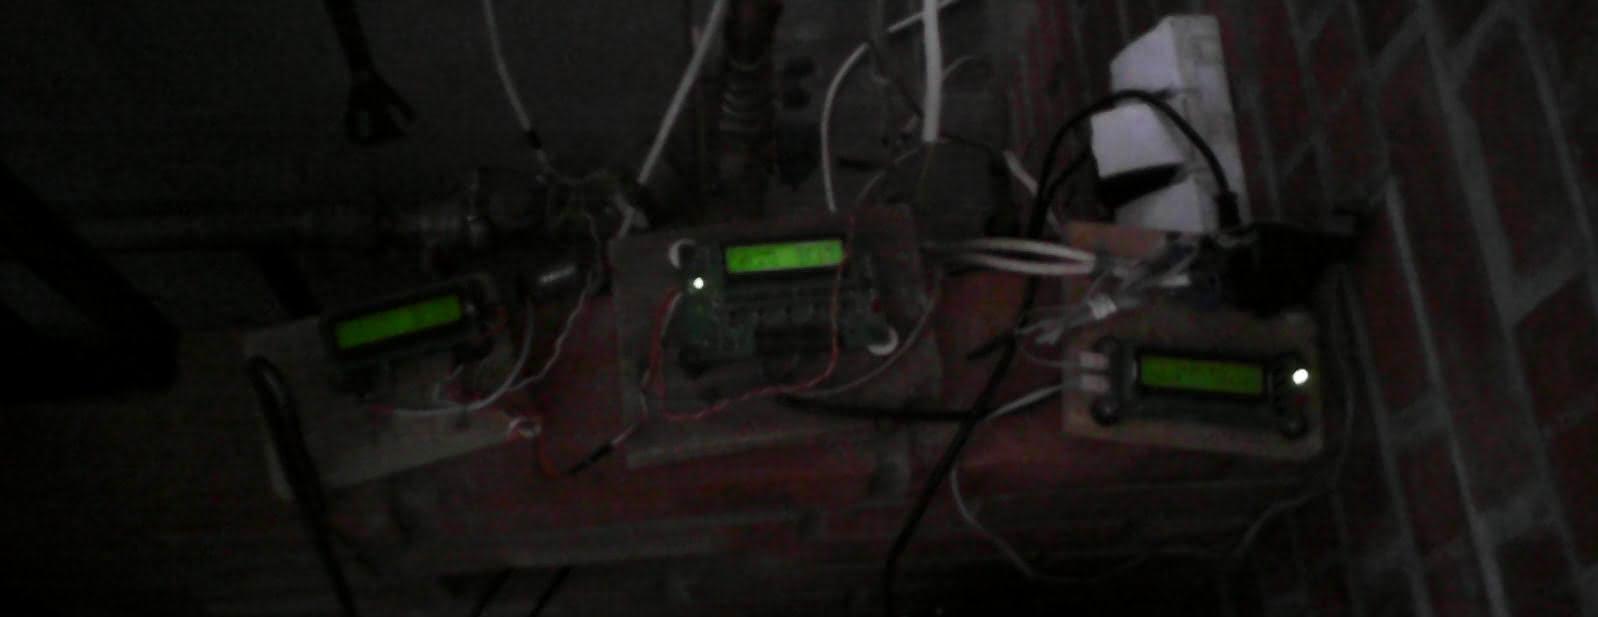 akumulacja ciepła